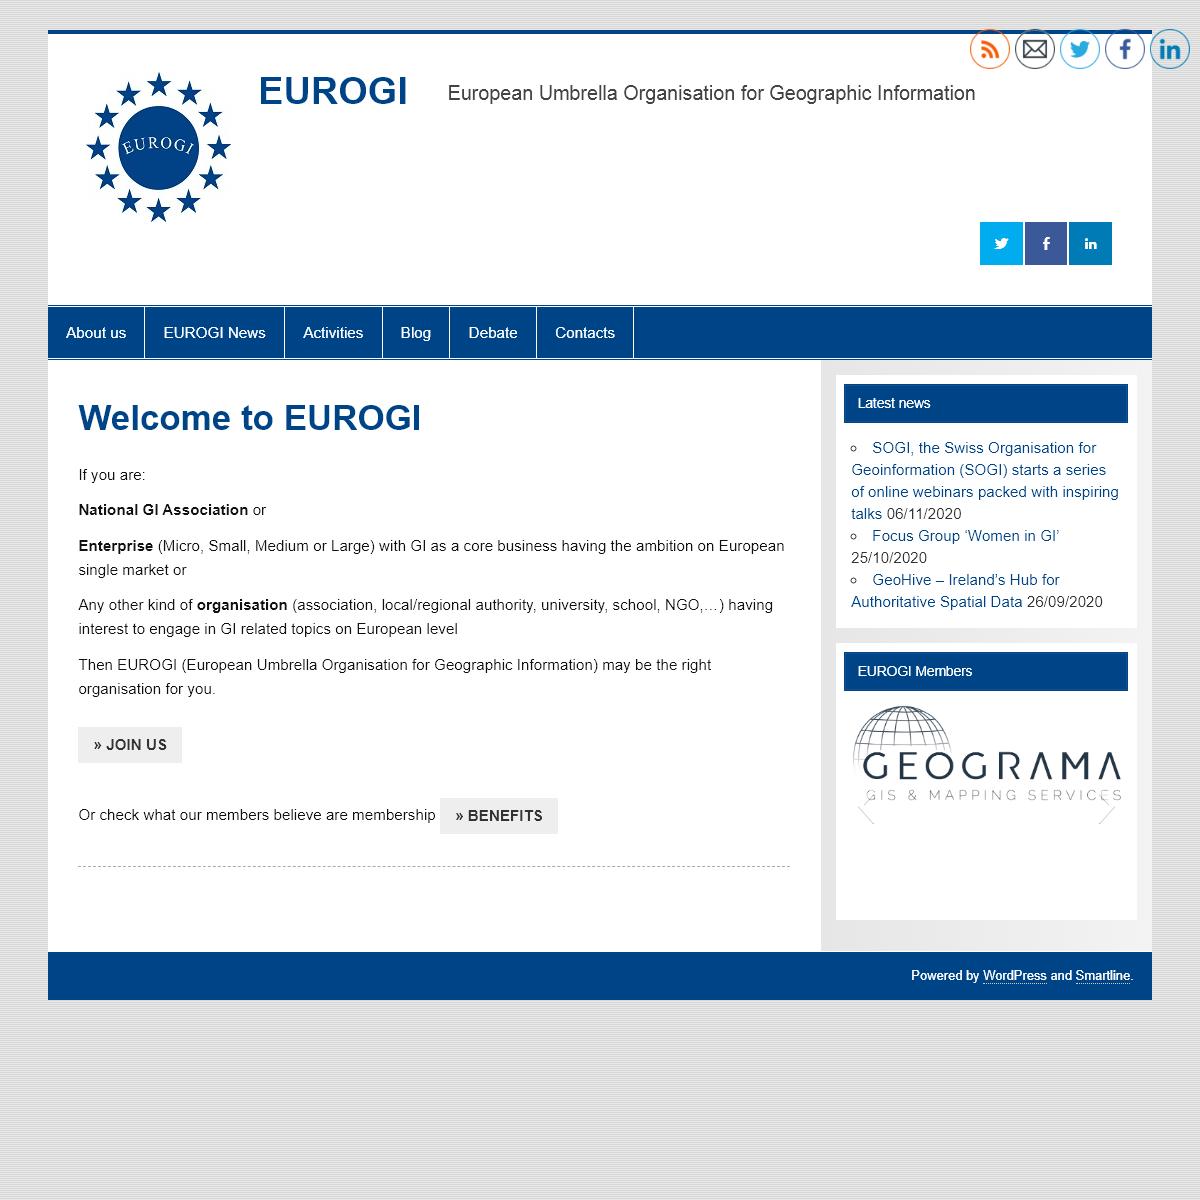 EUROGI – European Umbrella Organisation for Geographic Information